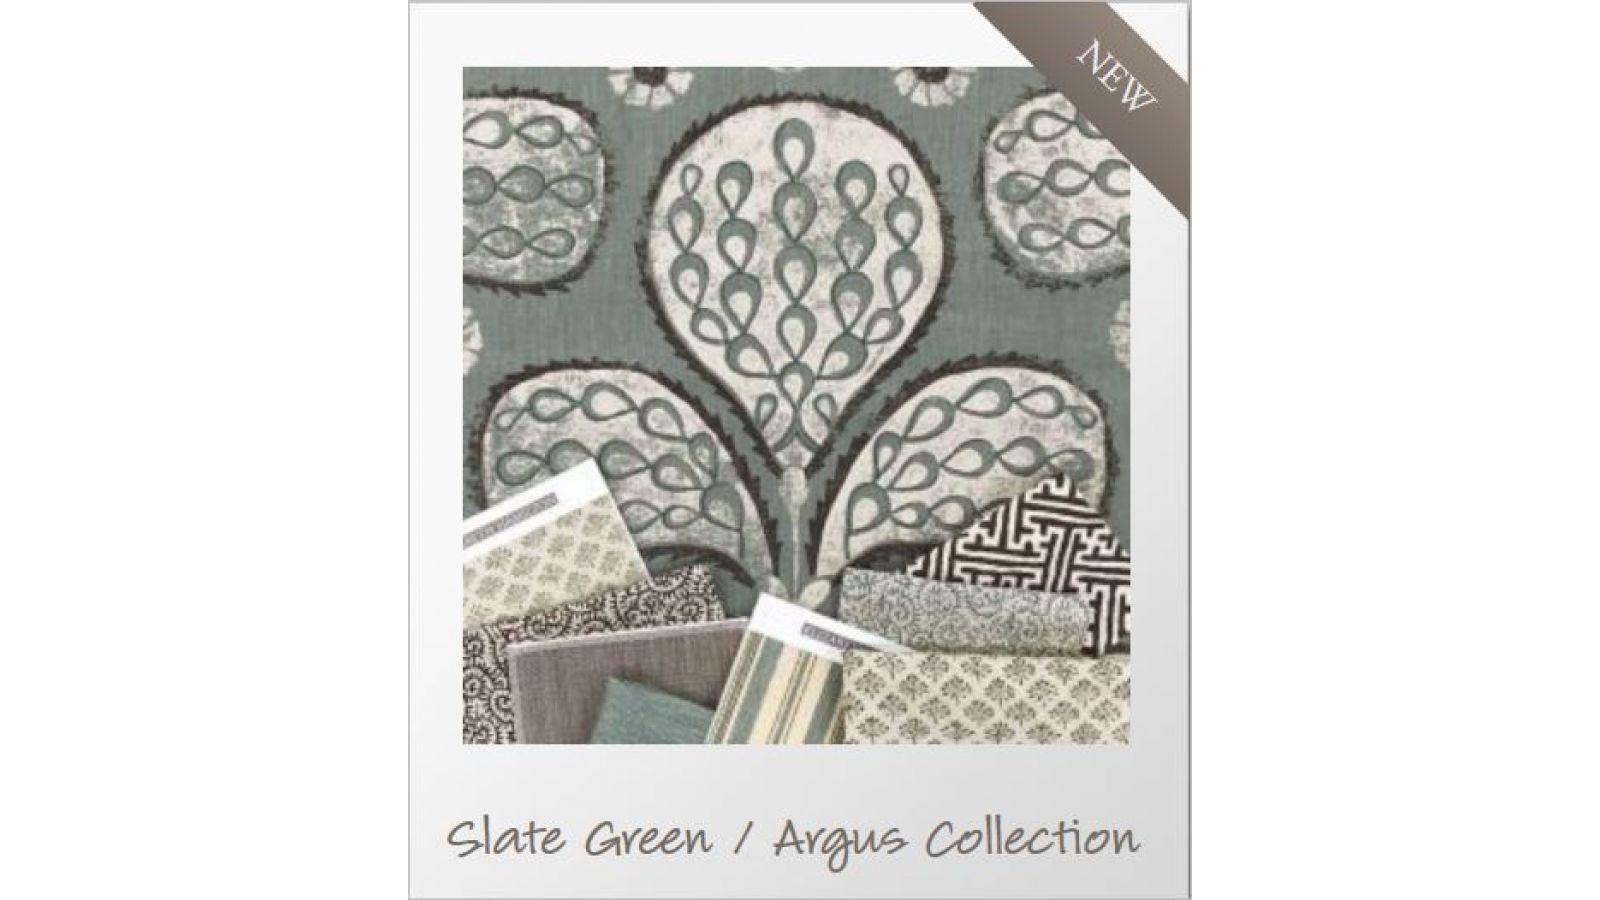 Argus - Slate Green scheme